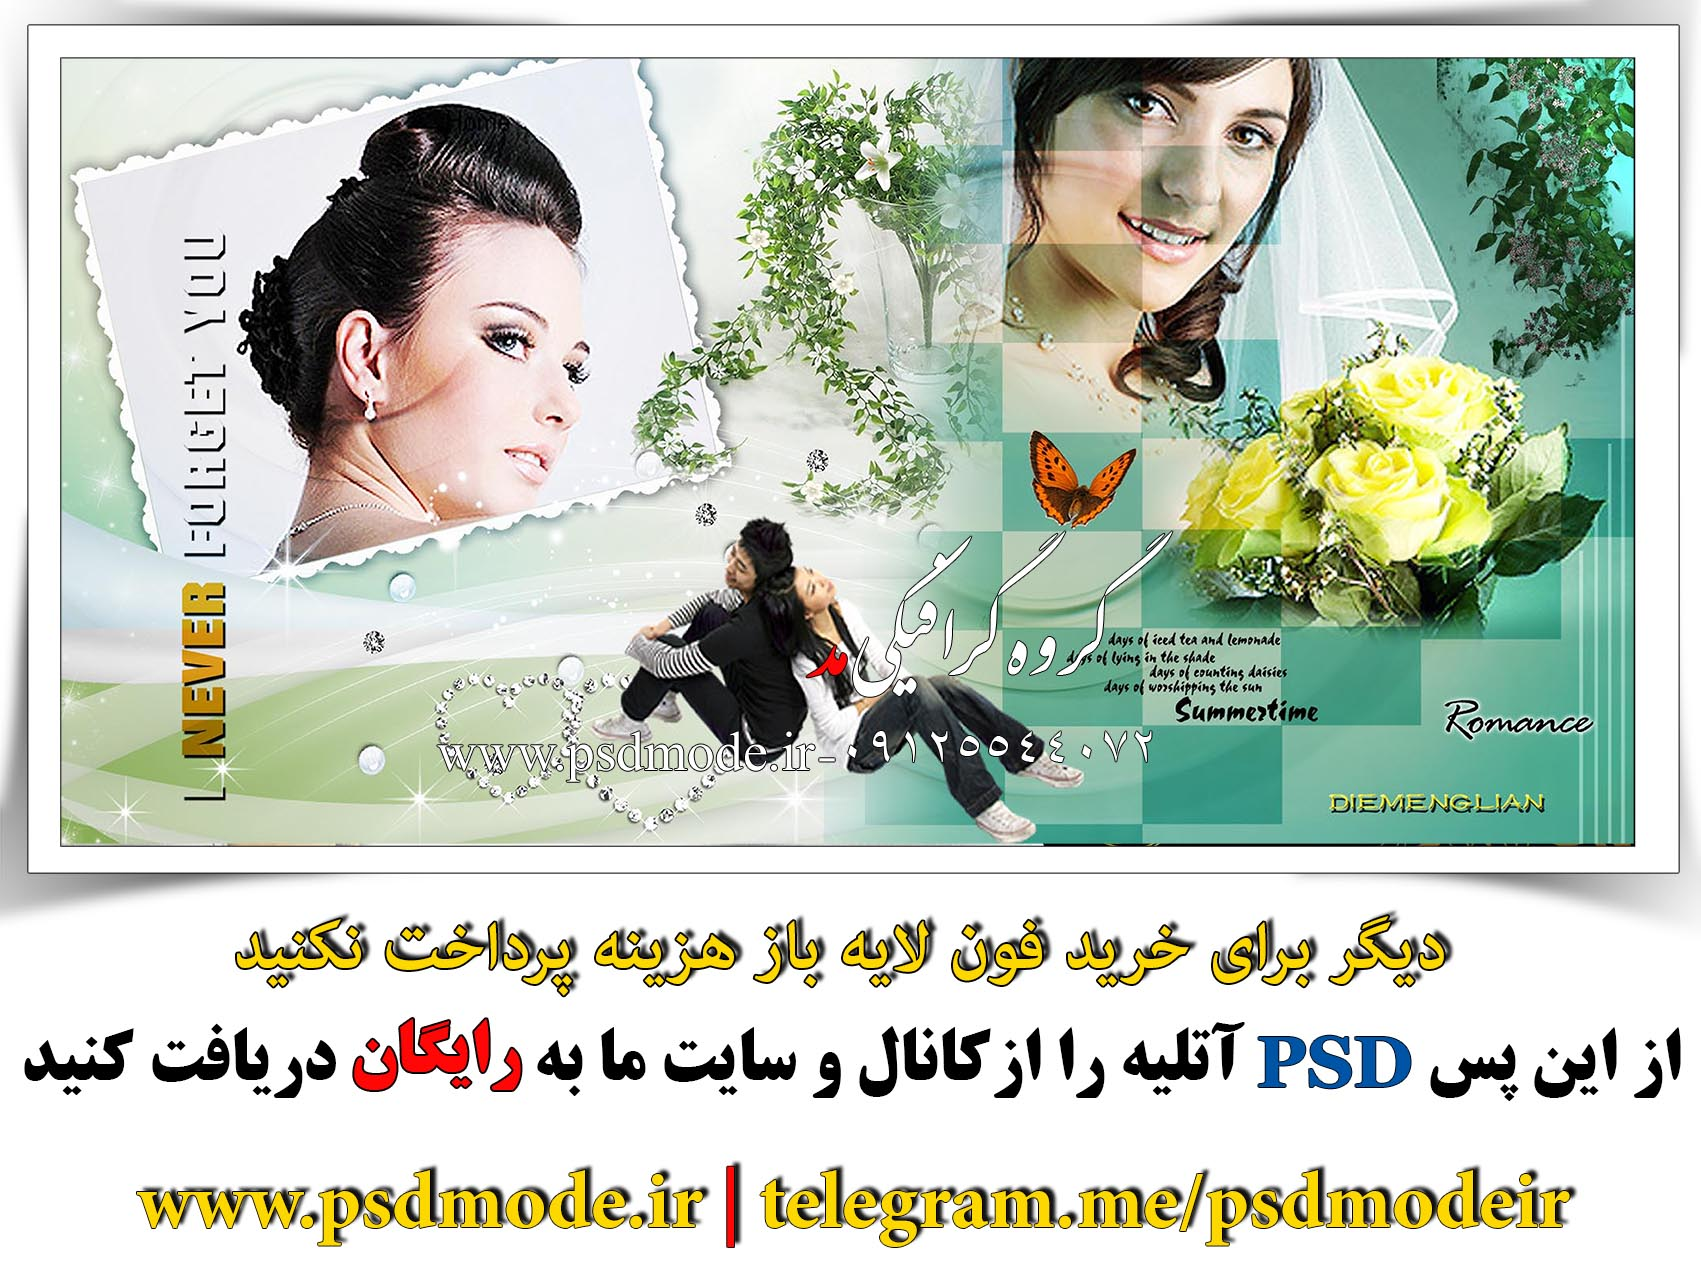 دانلود فون البوم ایتالیایی عروس و داماد